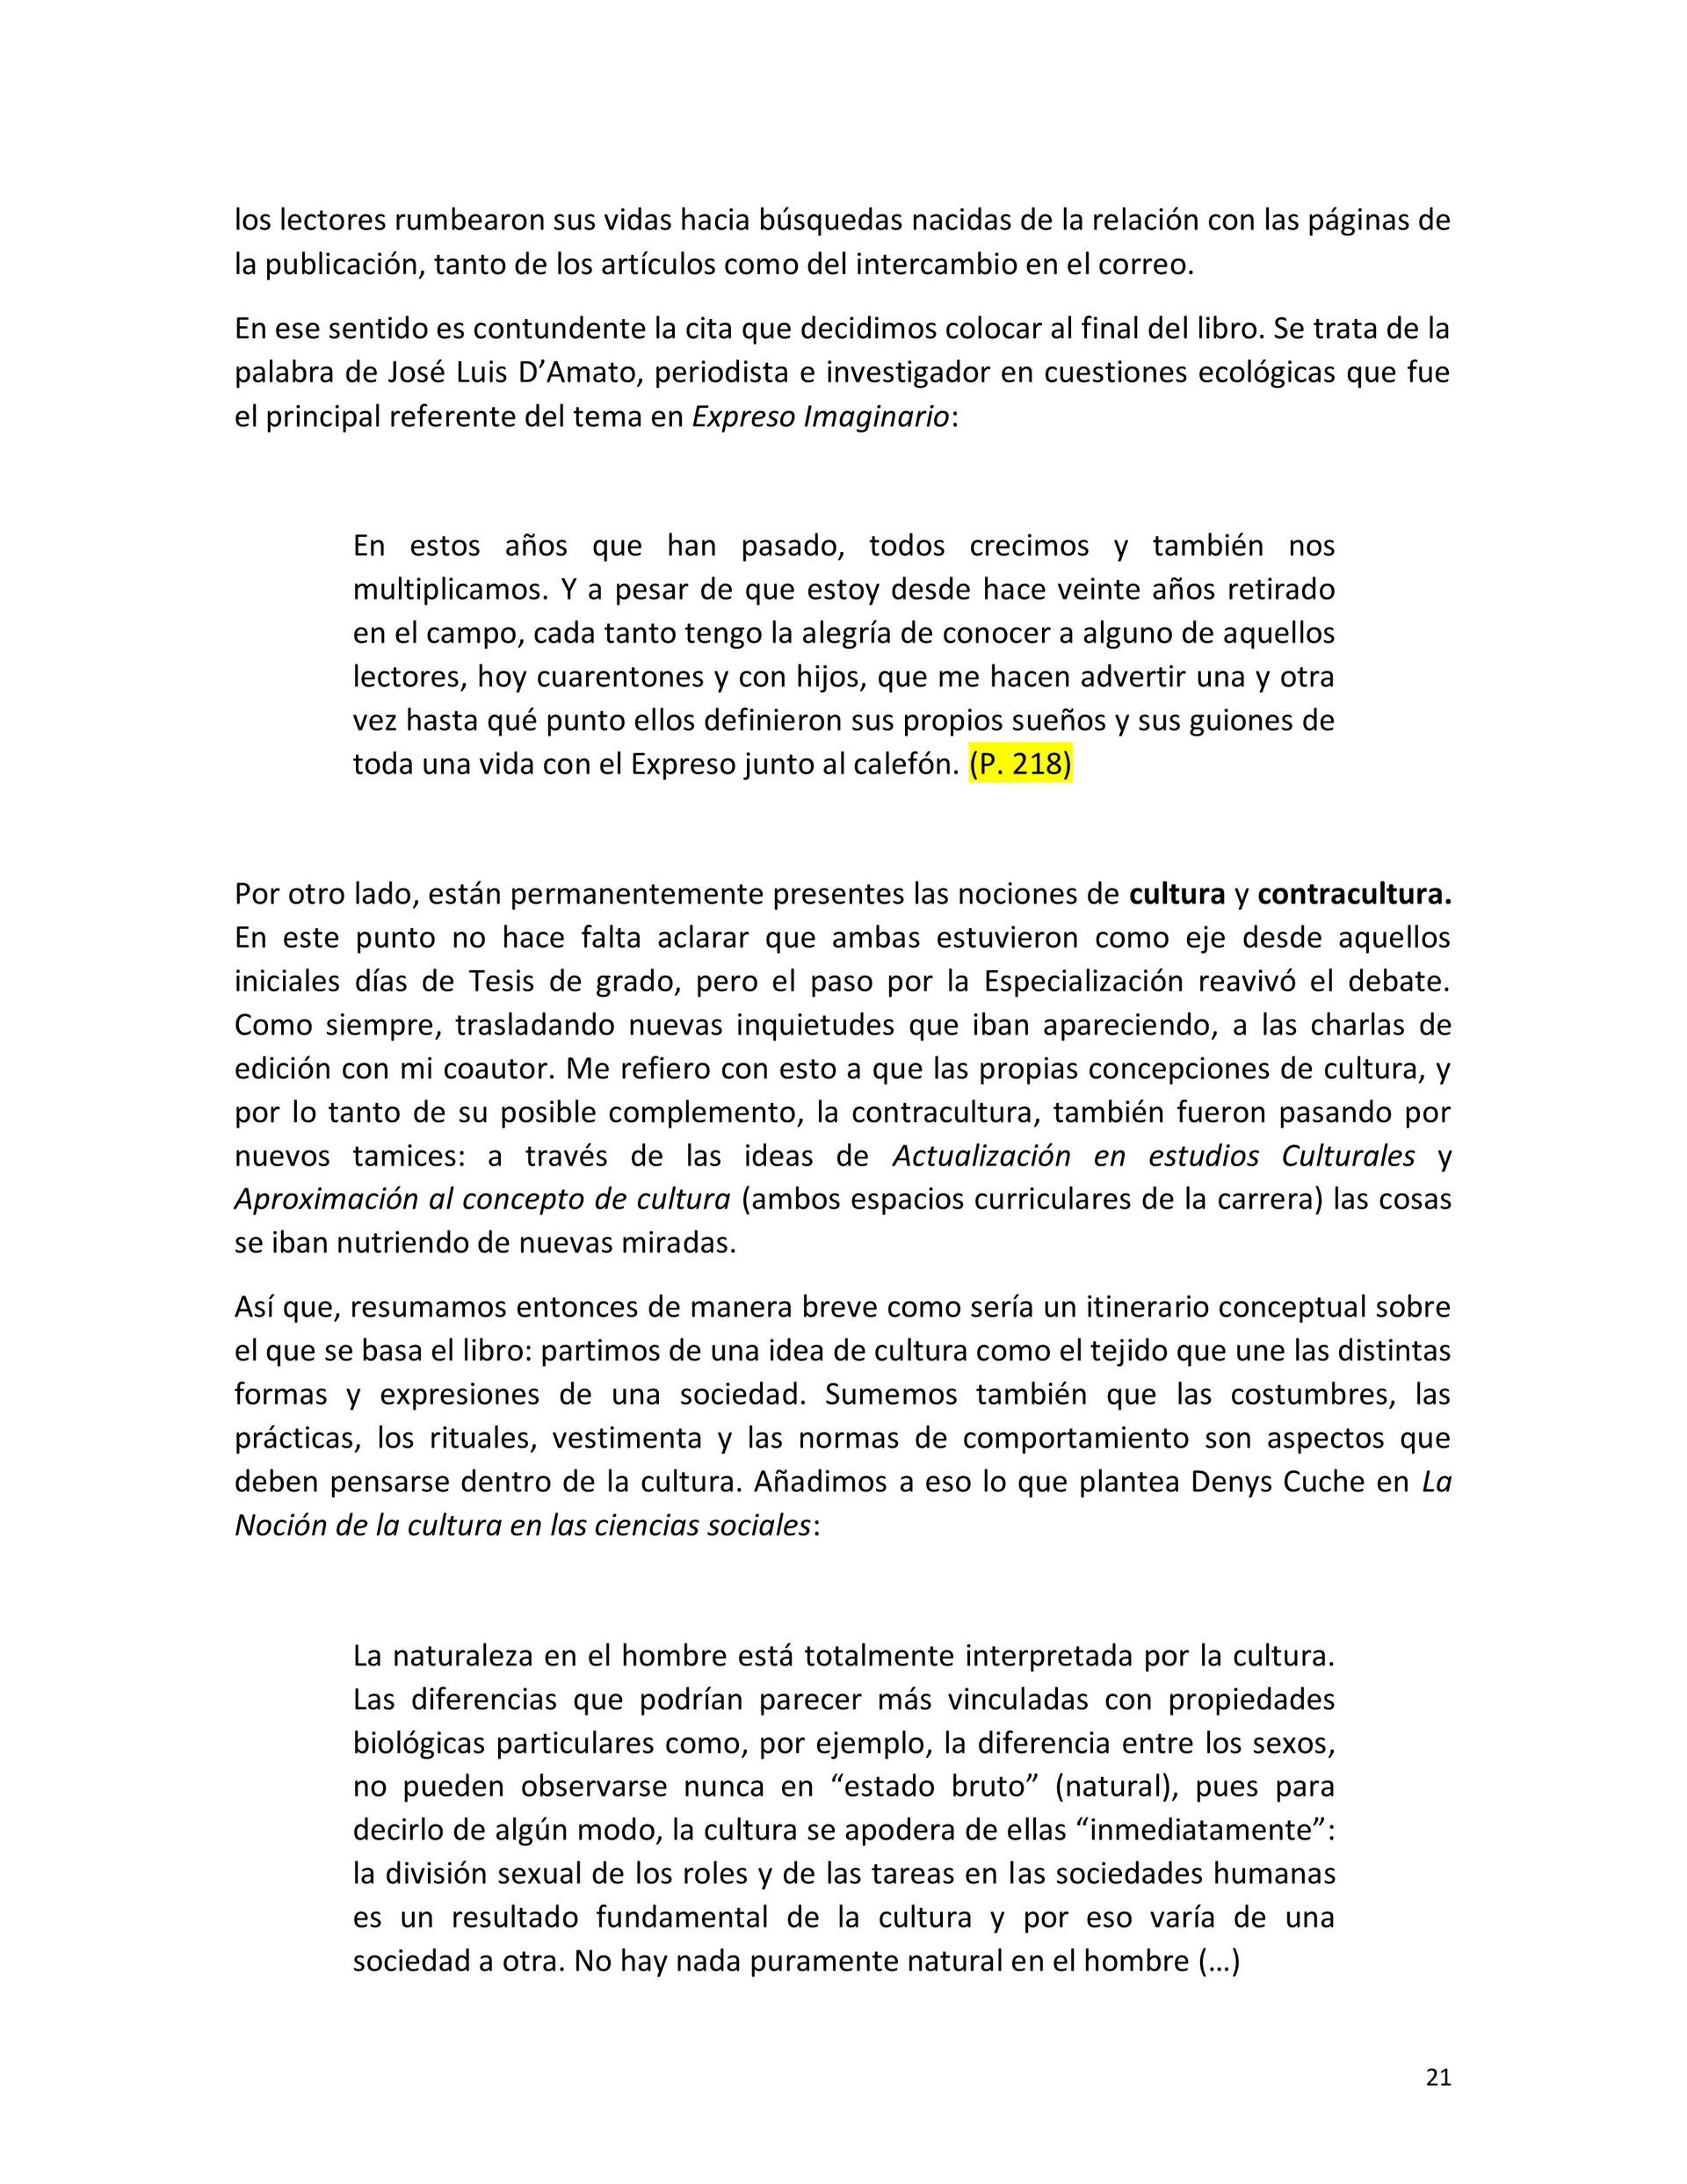 estacion_Page_20.jpeg